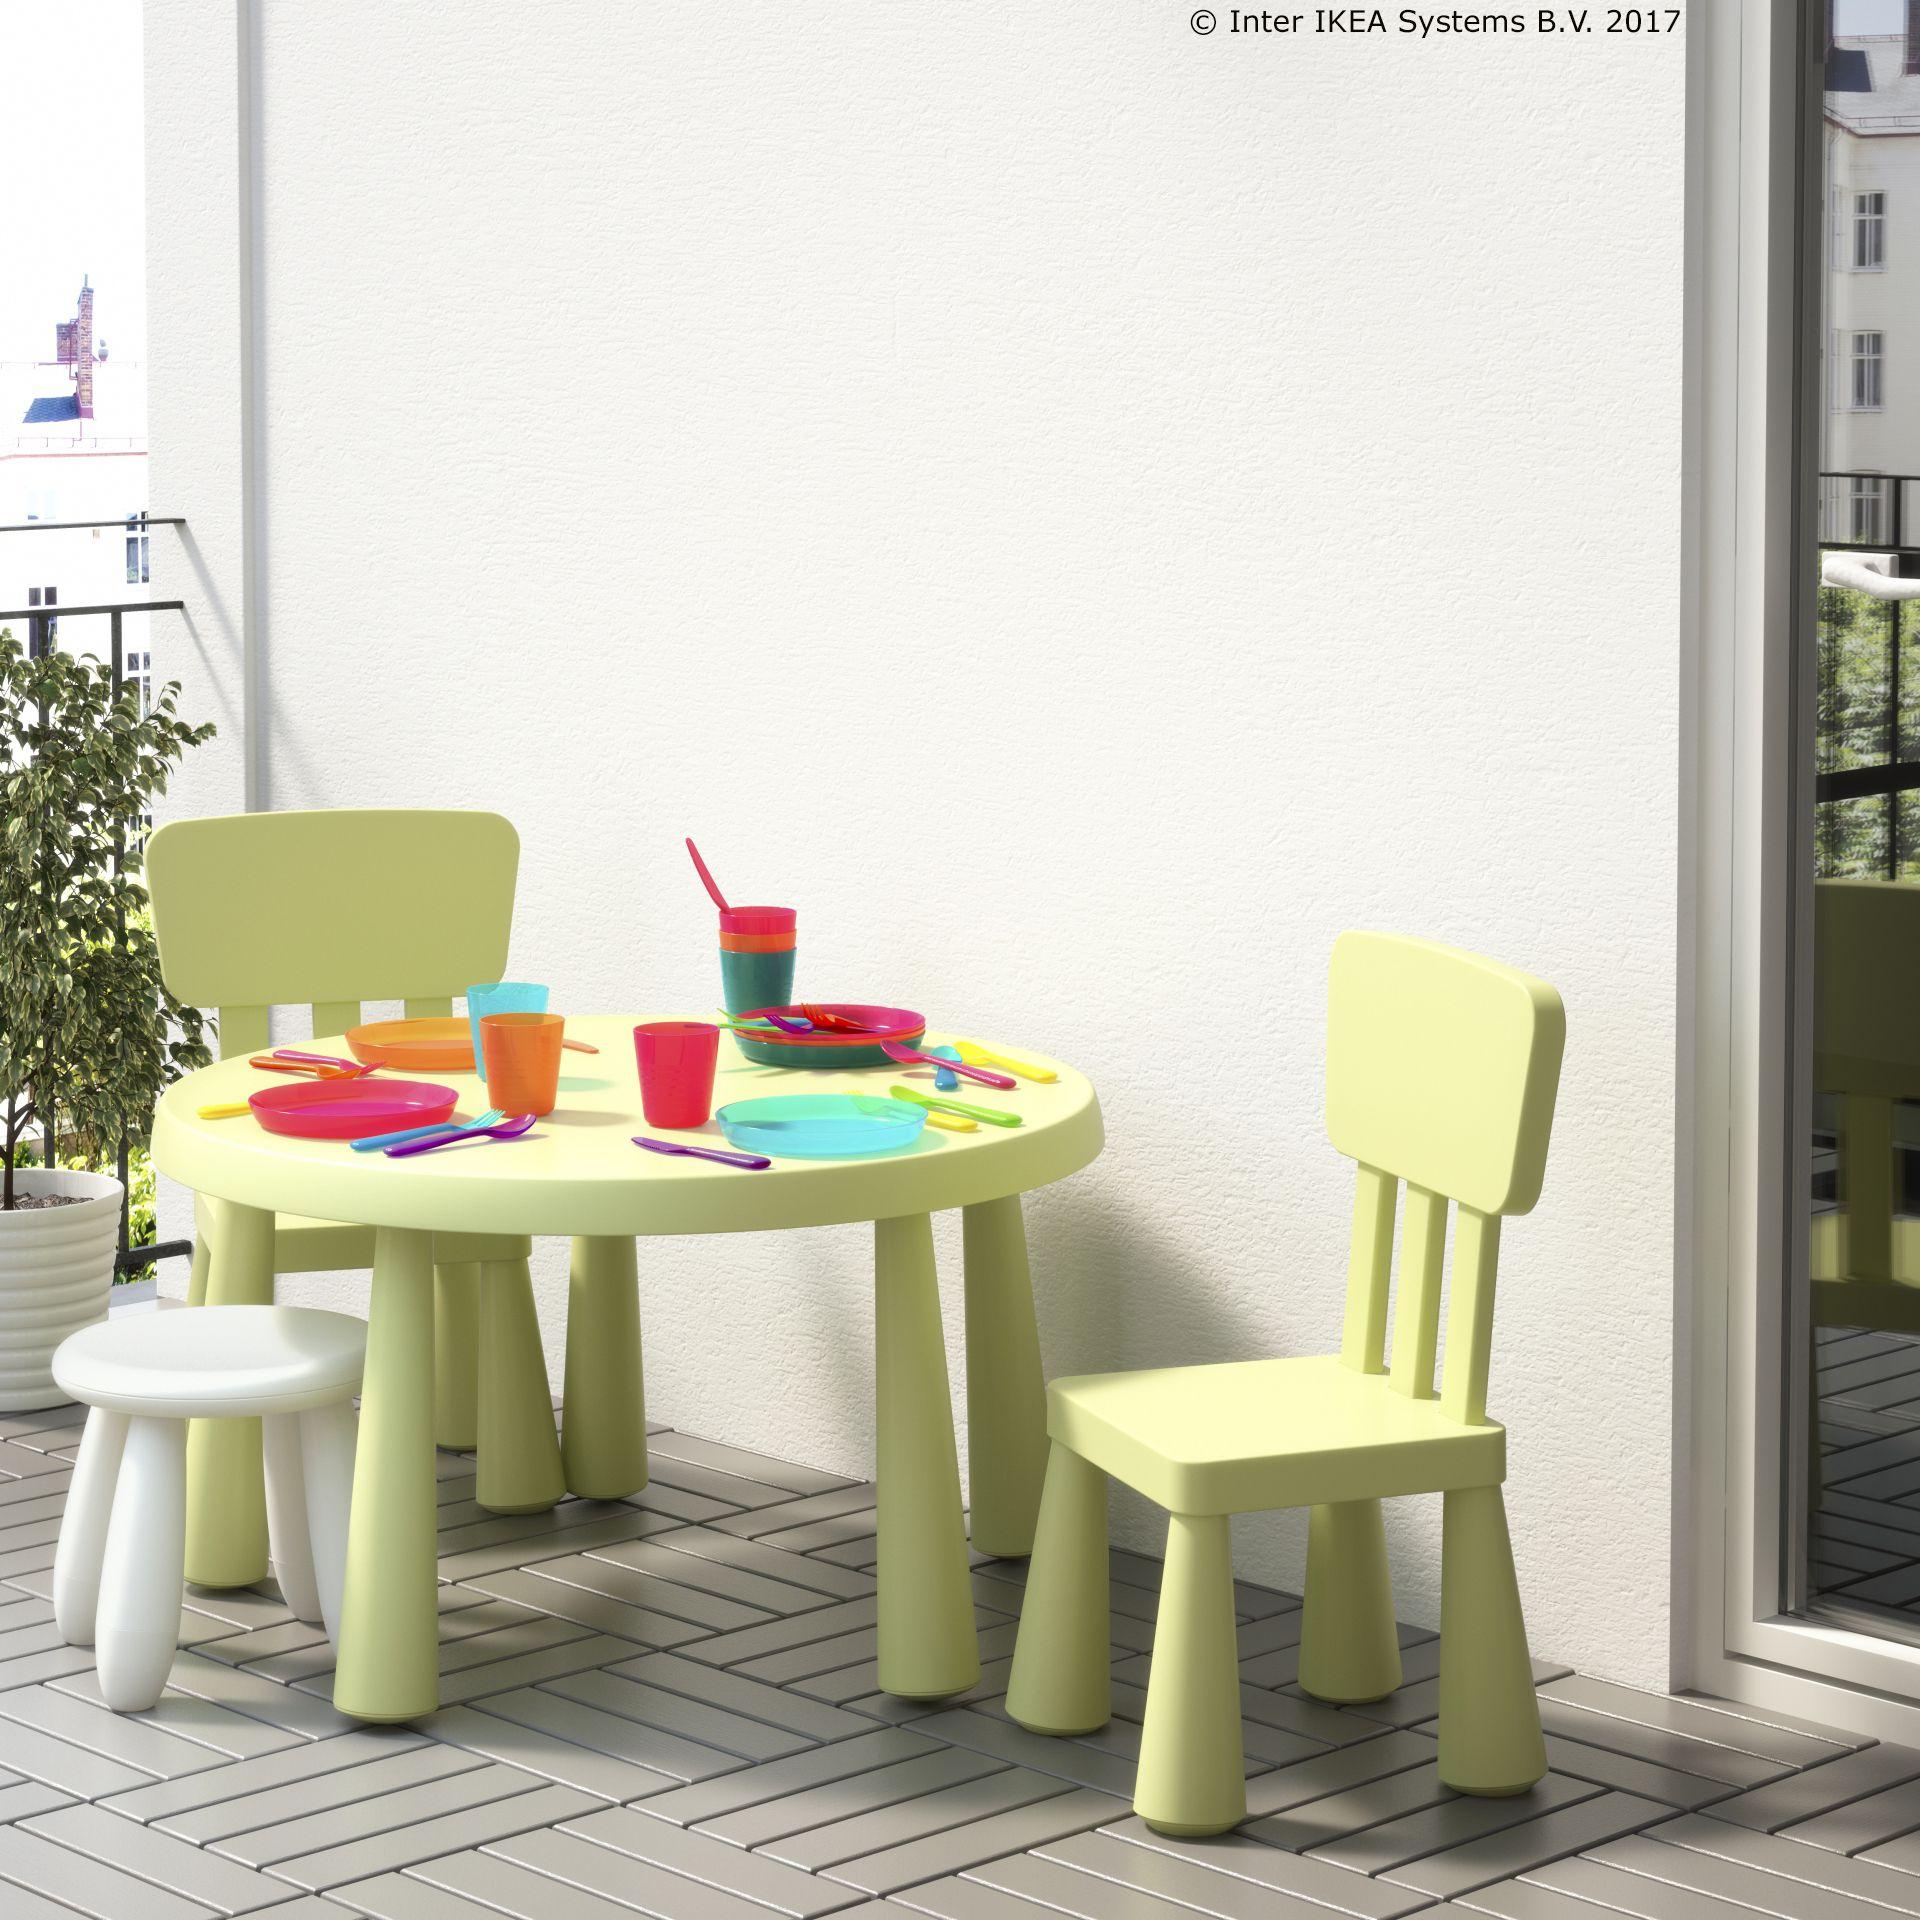 d301bcff1e72fbfb643cf090f184a345 Luxe De Table Basse Convertible Ikea Des Idées